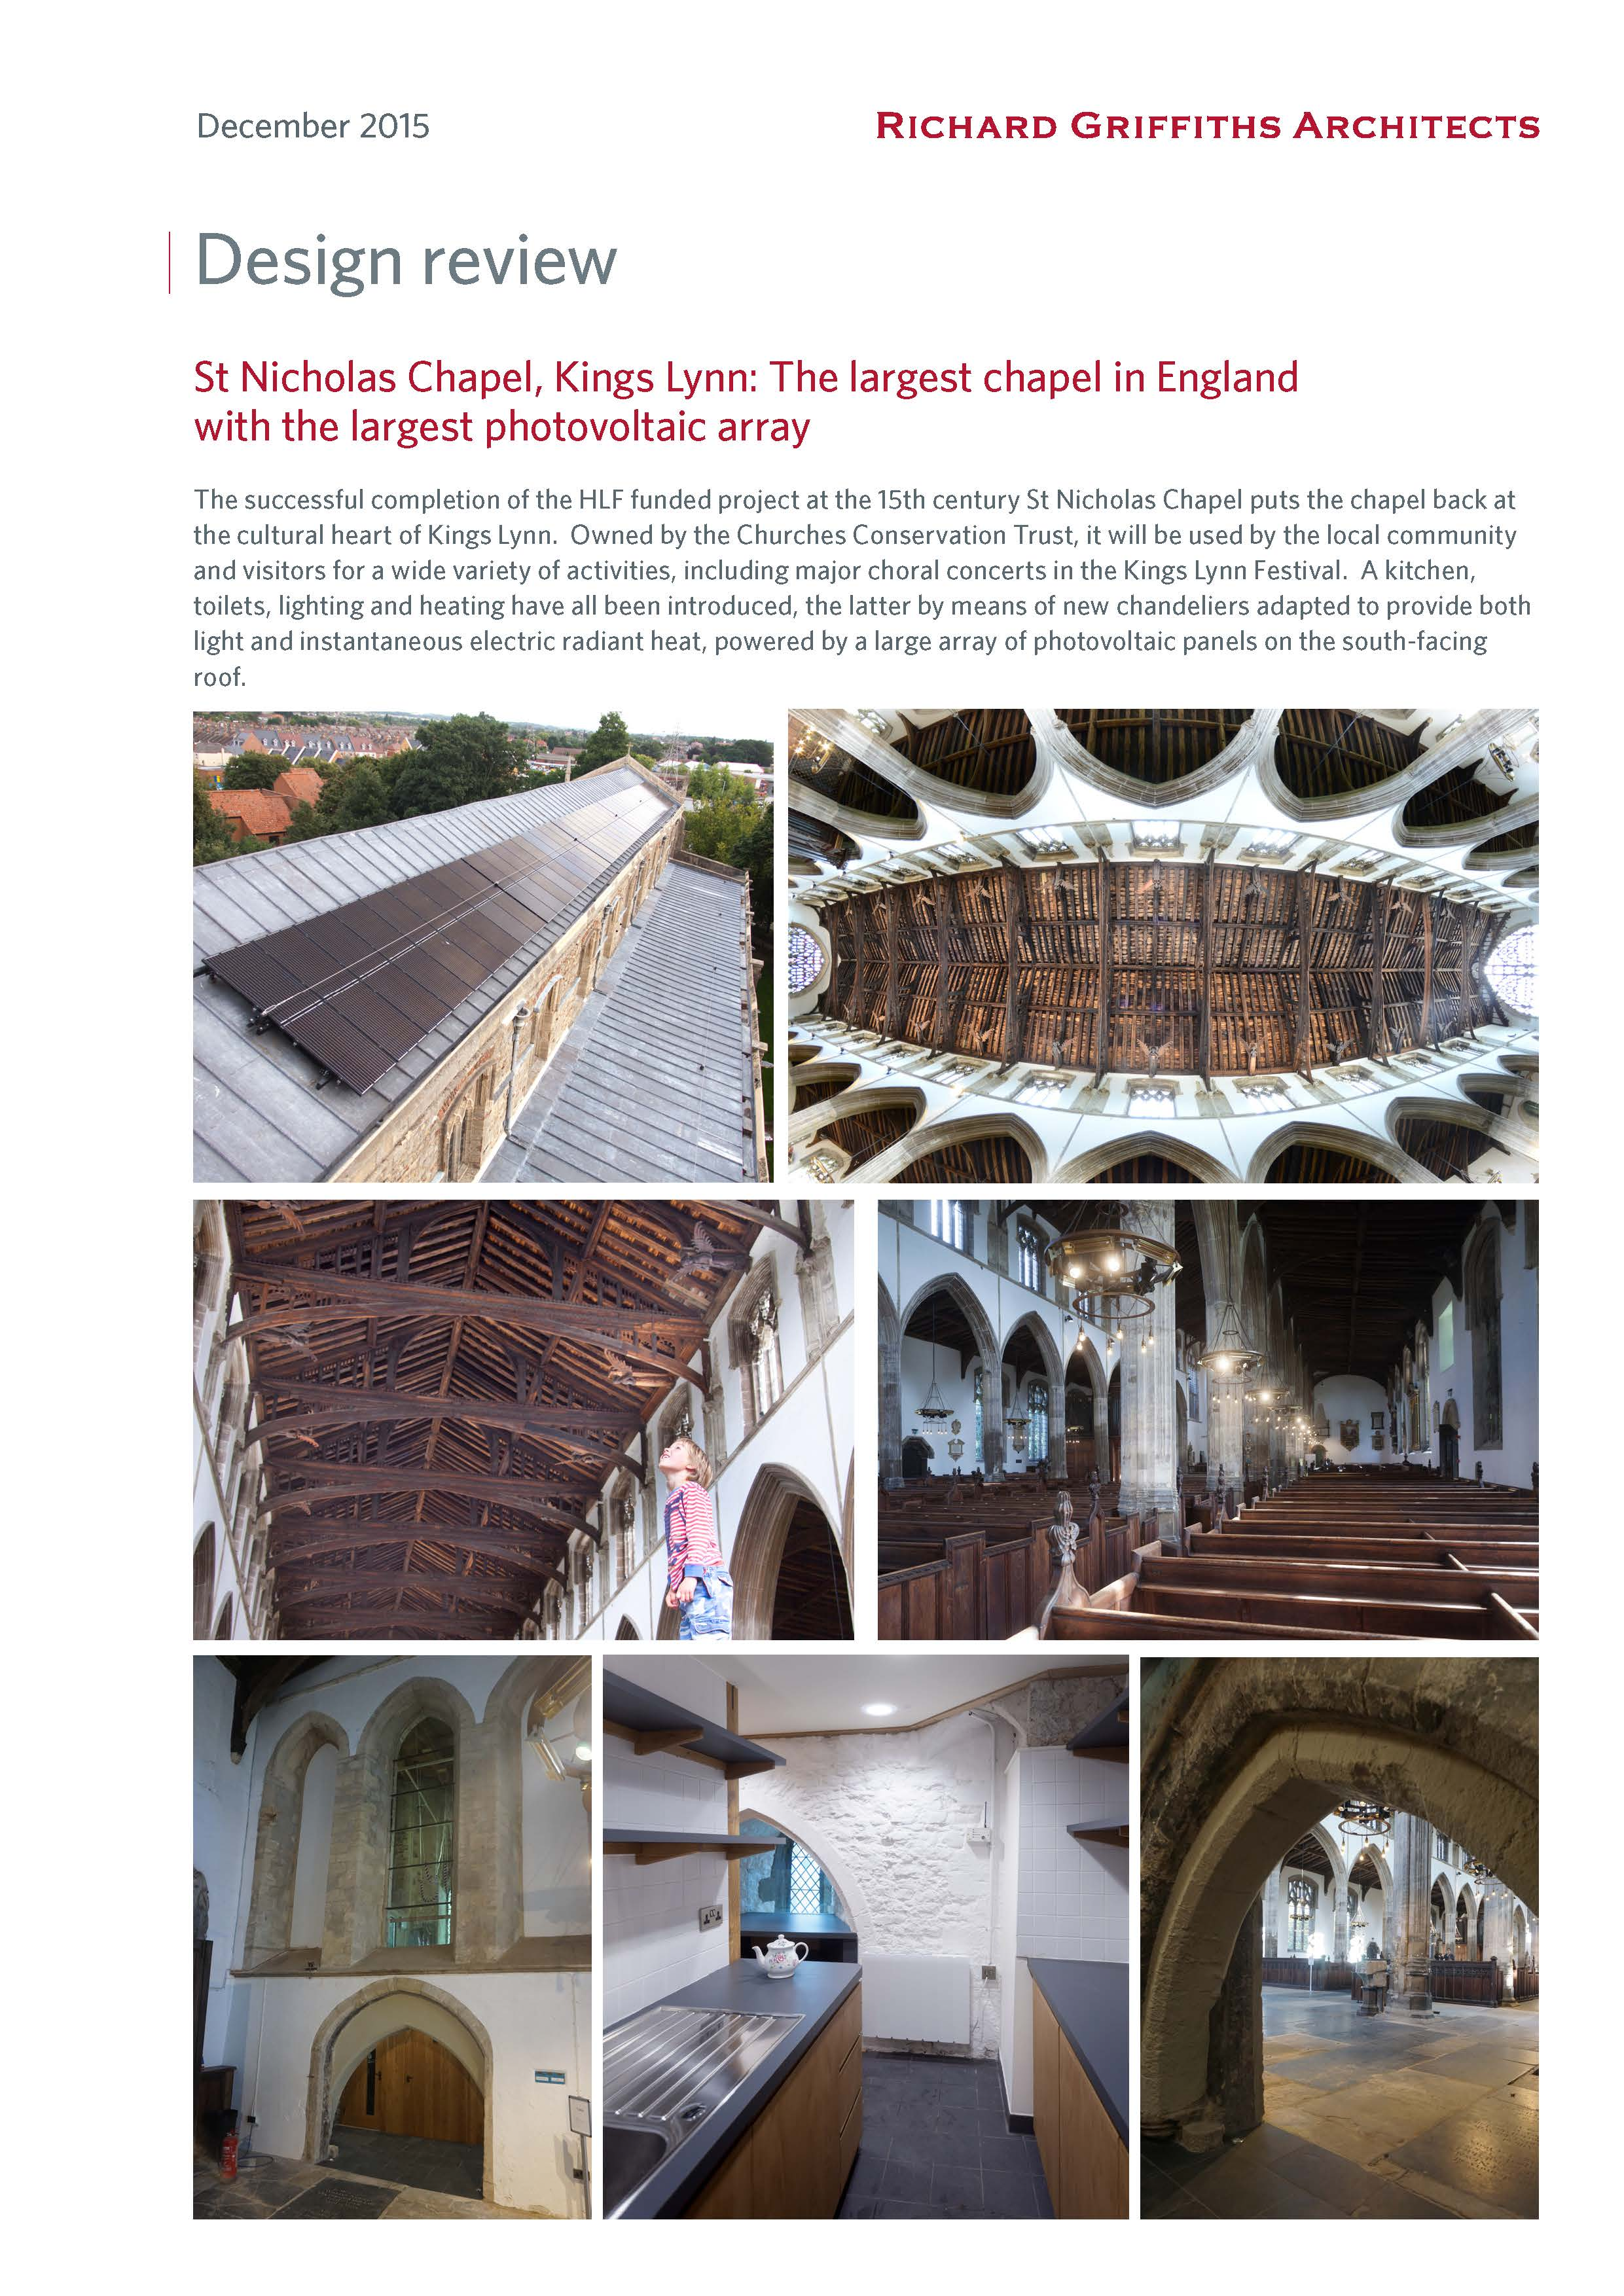 Design Review, December 2015